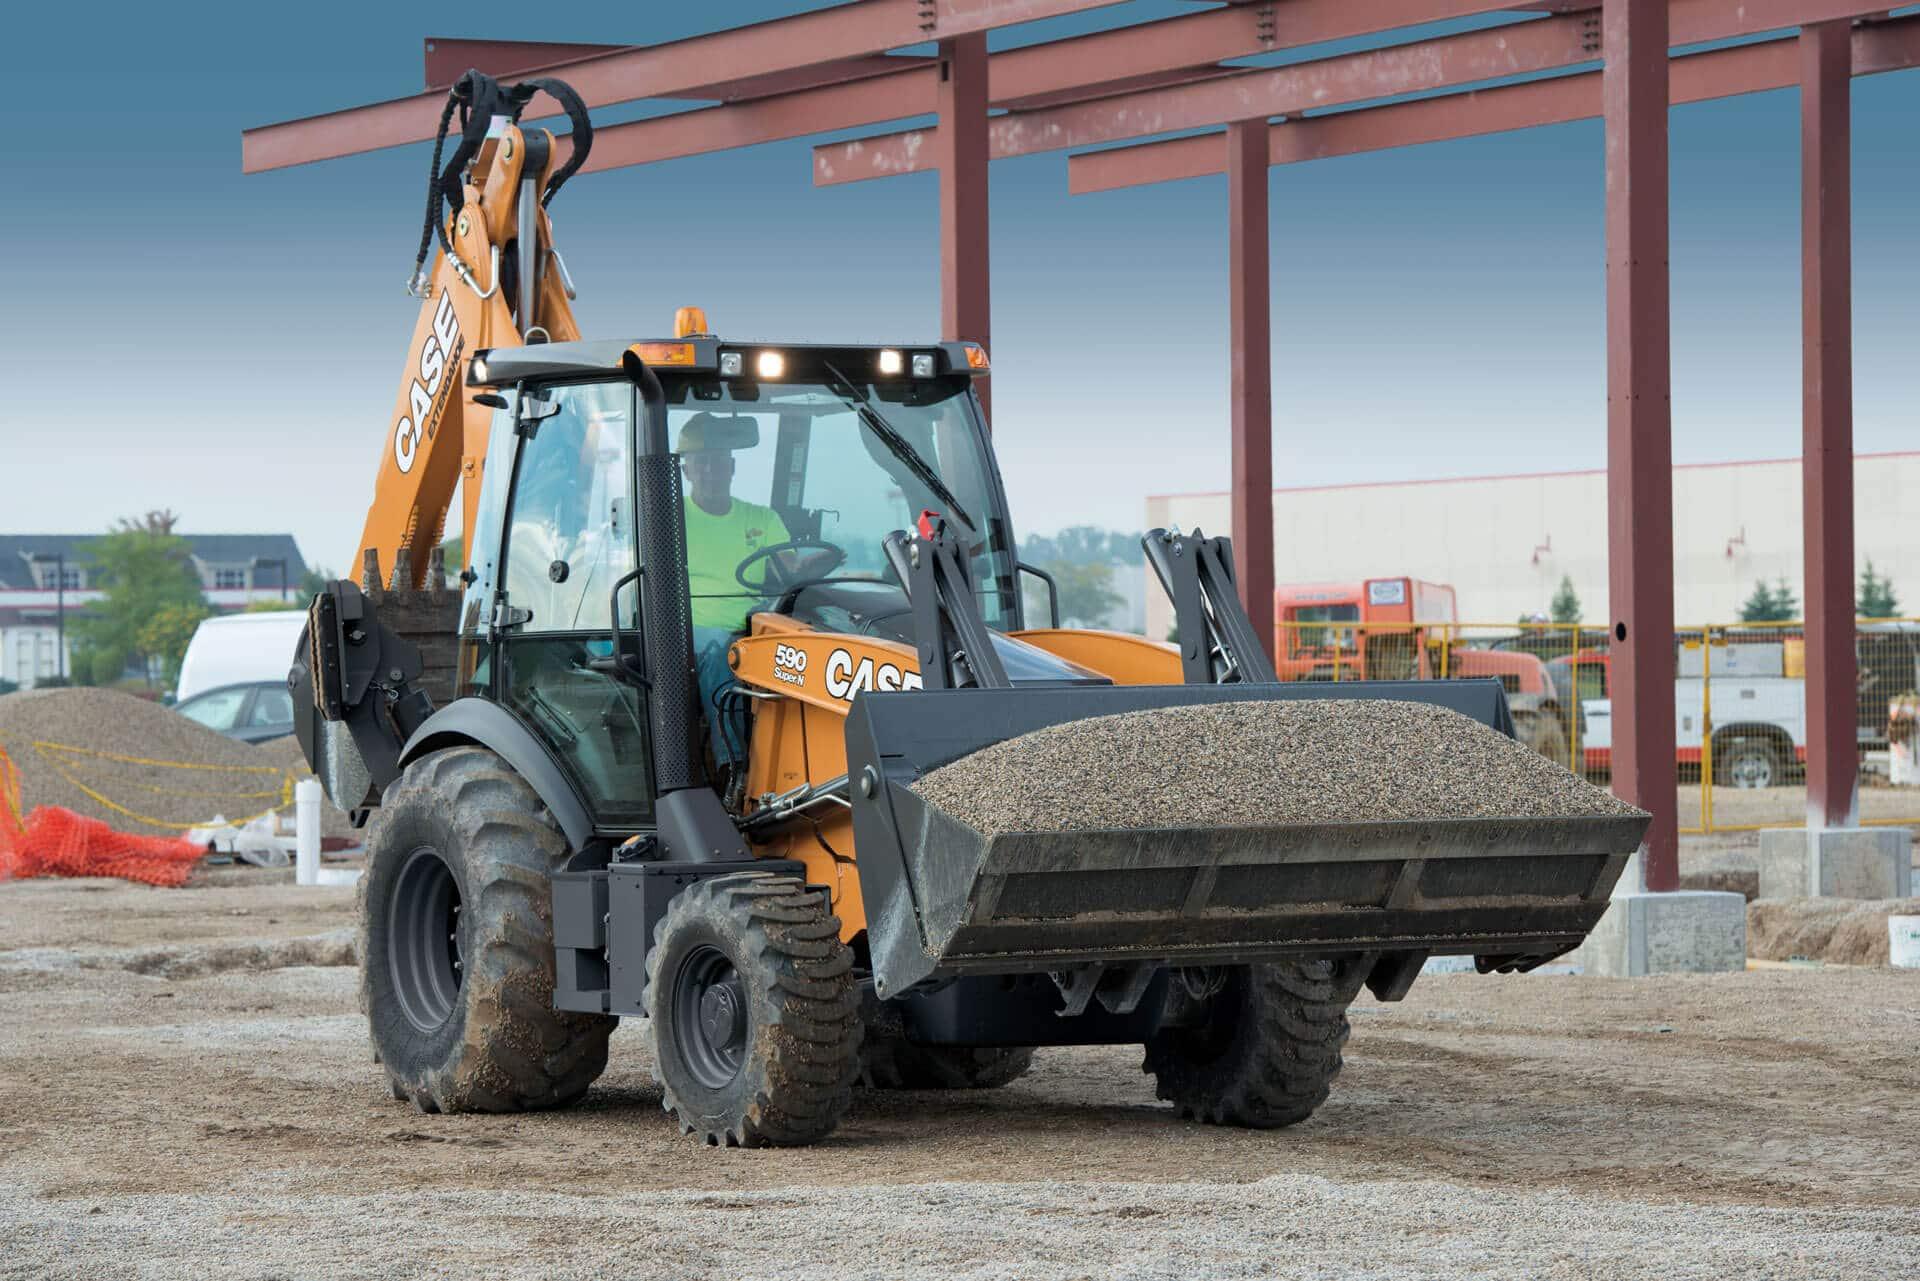 case 590 super n backhoe loader case construction equipment rh casece com Case 580 Super D Case 580 Rim